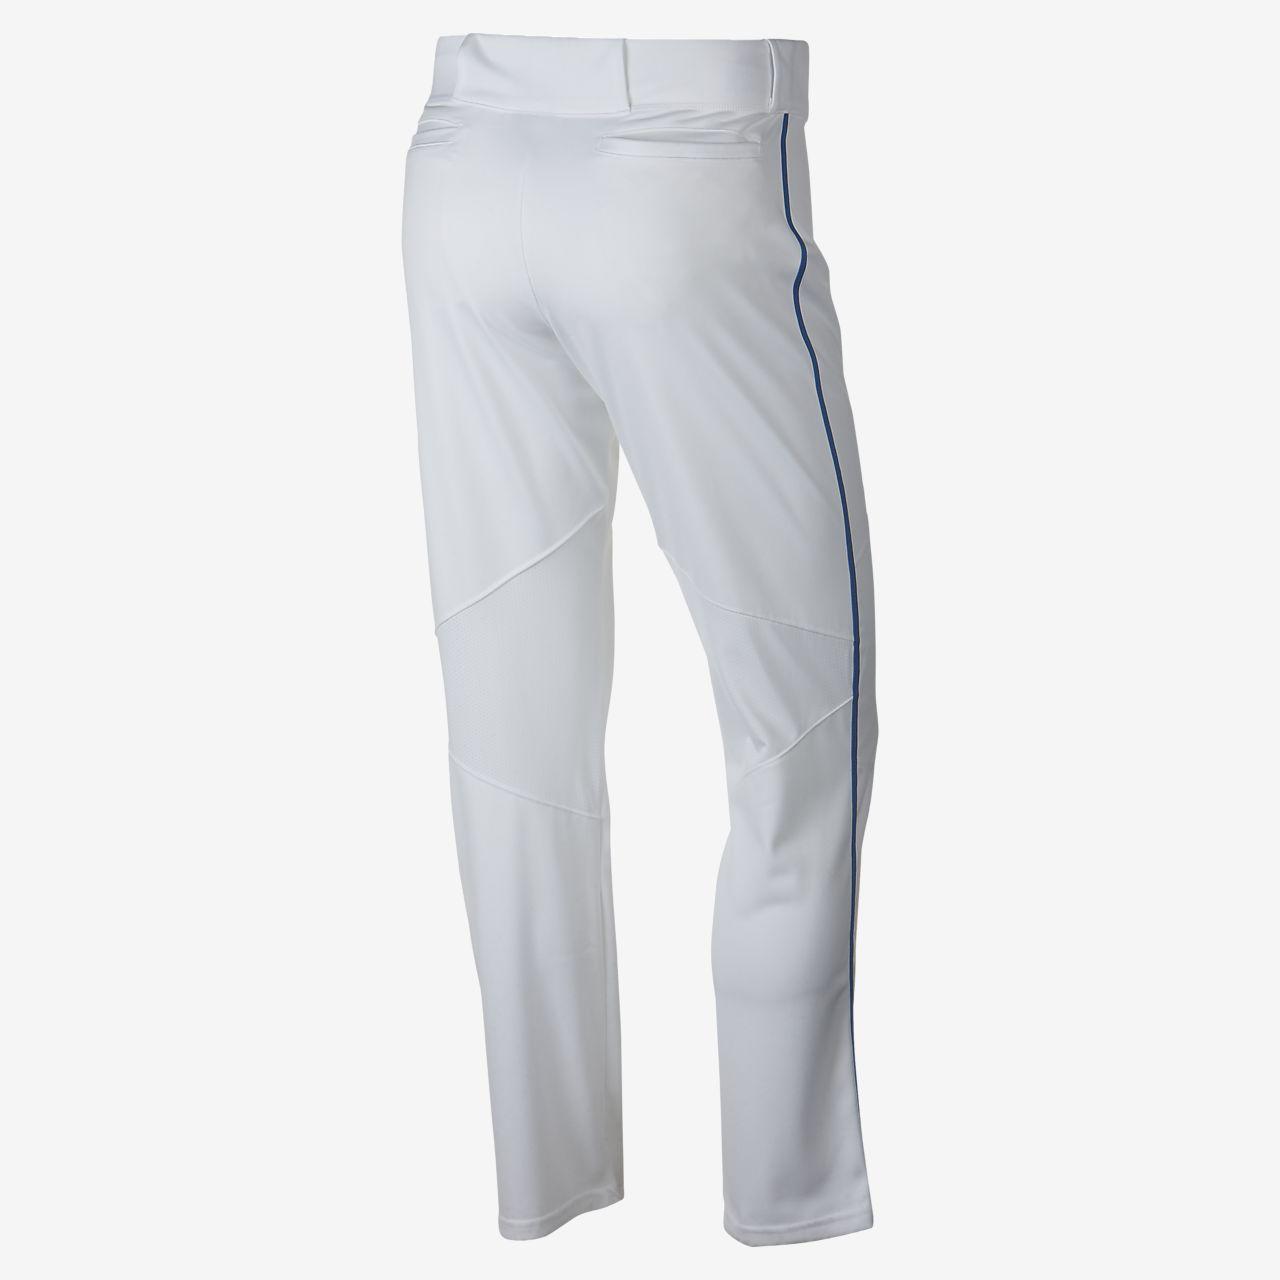 ... Nike Vapor Pro Men's Baseball Pants